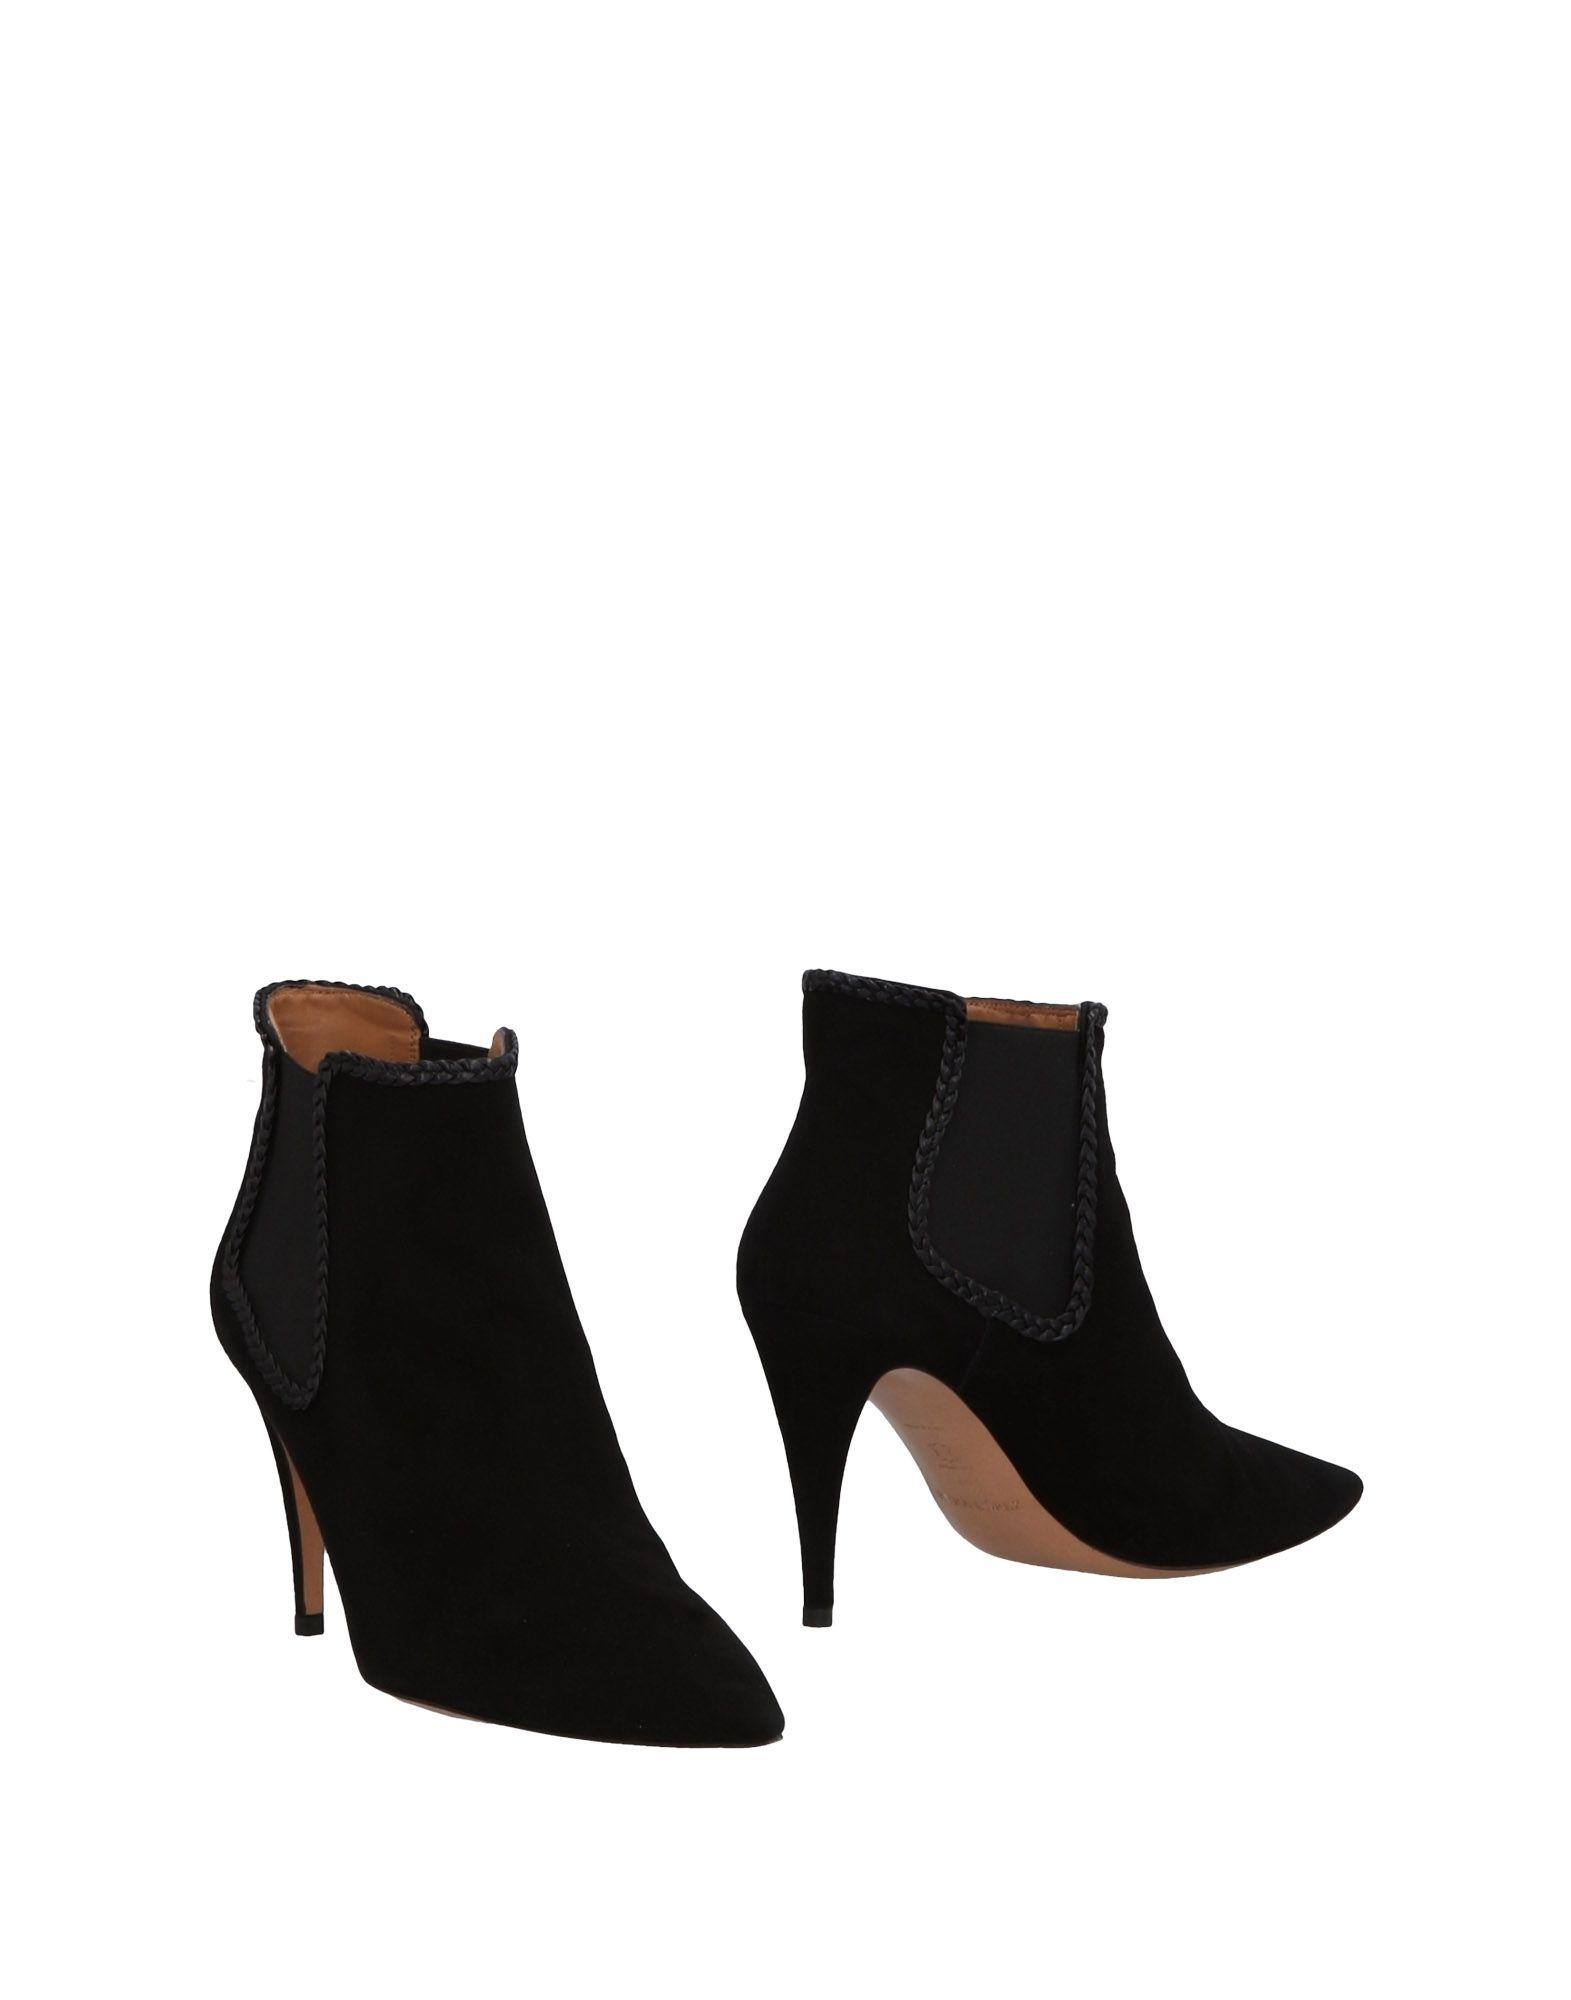 Pura 11469227TPGut López Stiefelette Damen  11469227TPGut Pura aussehende strapazierfähige Schuhe a2f5bc